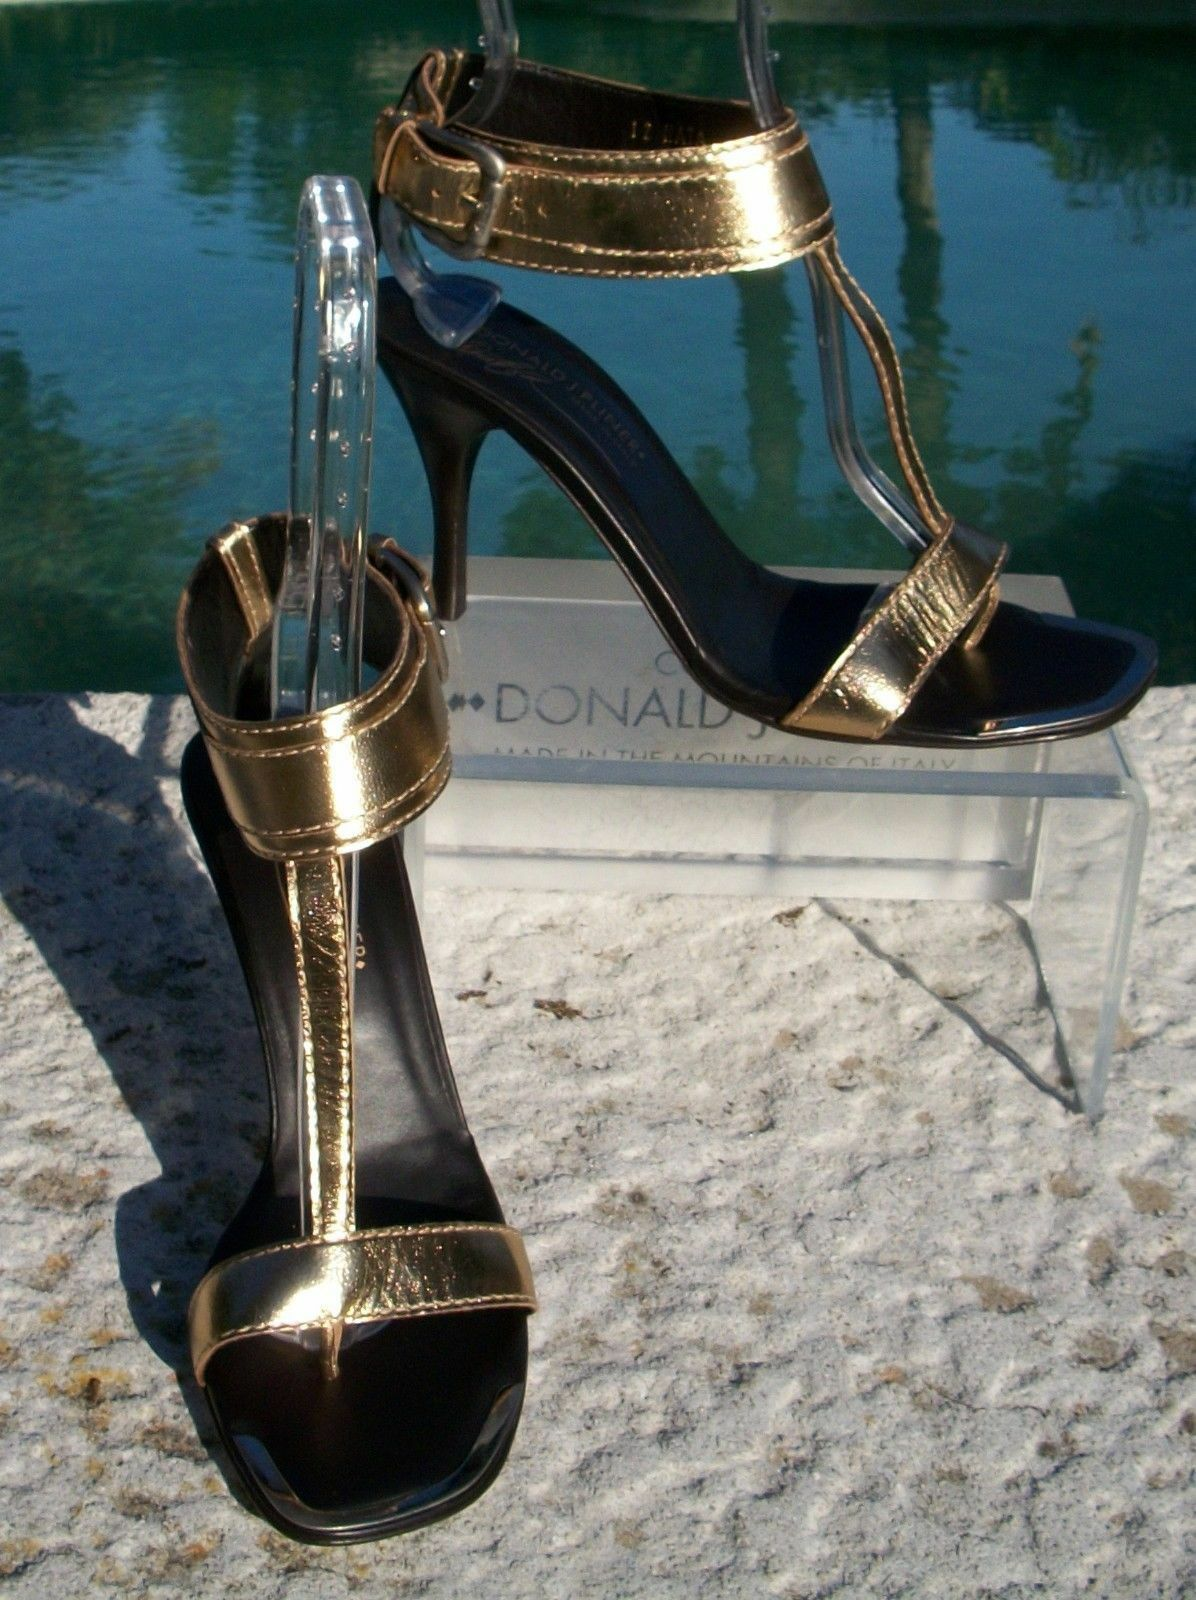 Donald Pliner Couture Platino Platino Platino Metallic Leather schuhe New Gold - Silber  355 NIB a78ce7